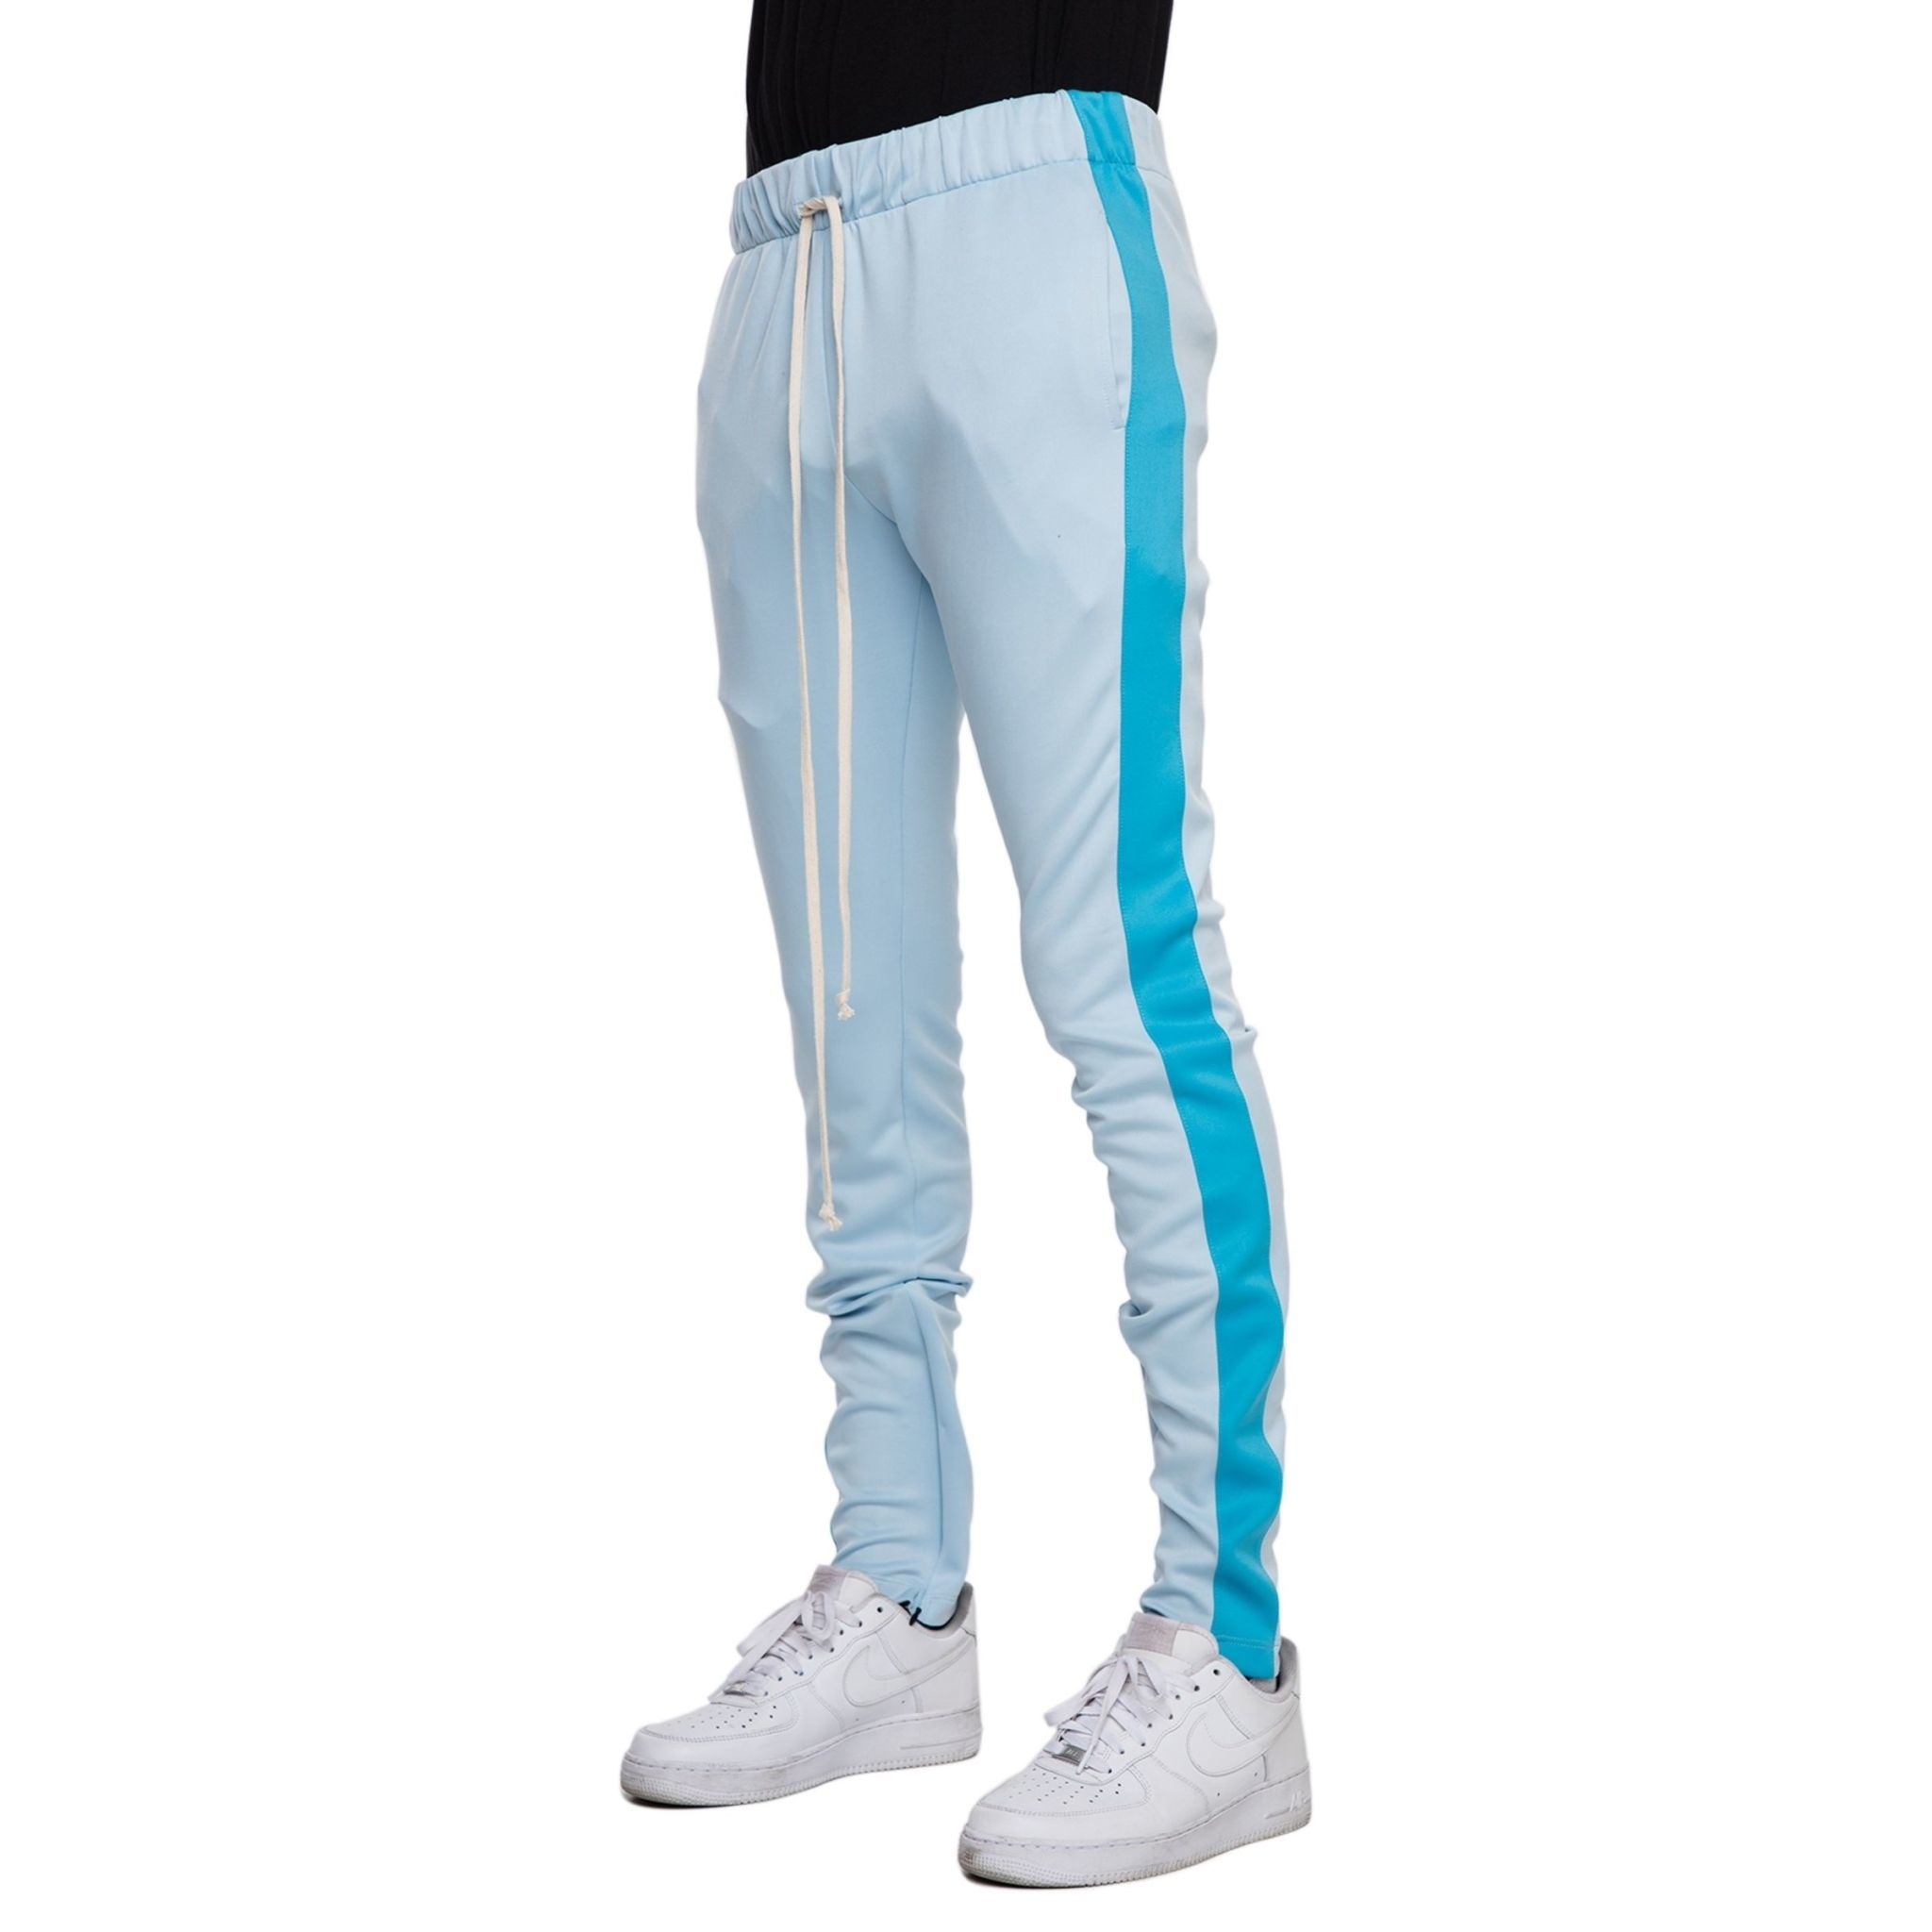 92c6bda9cc66ec eptm track pants (pastel blue) - OSO:a style lab